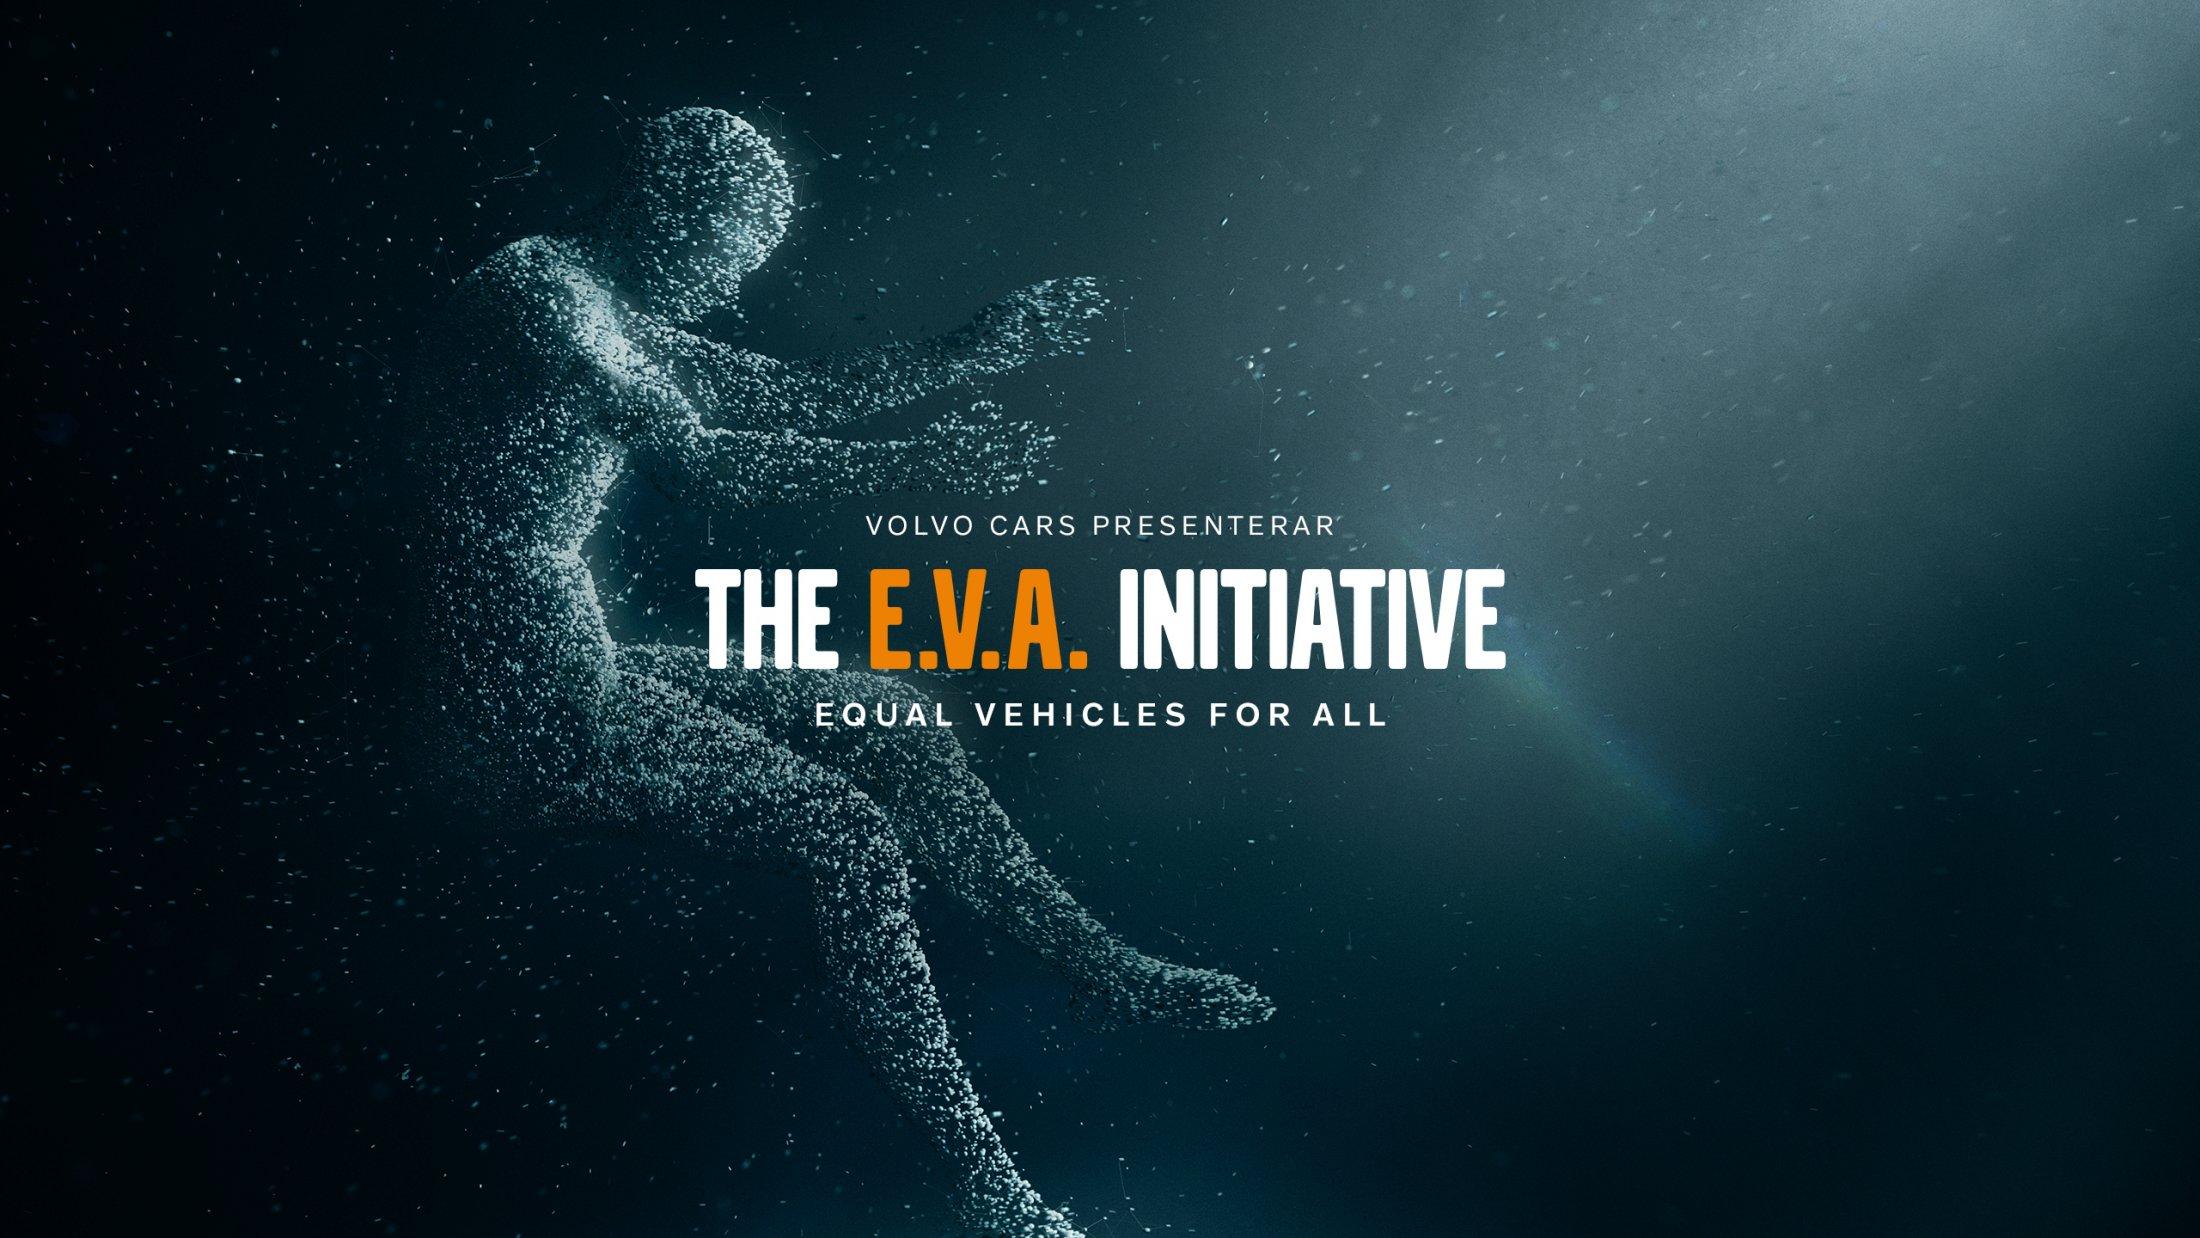 Thumbnail for The E.V.A Initiative